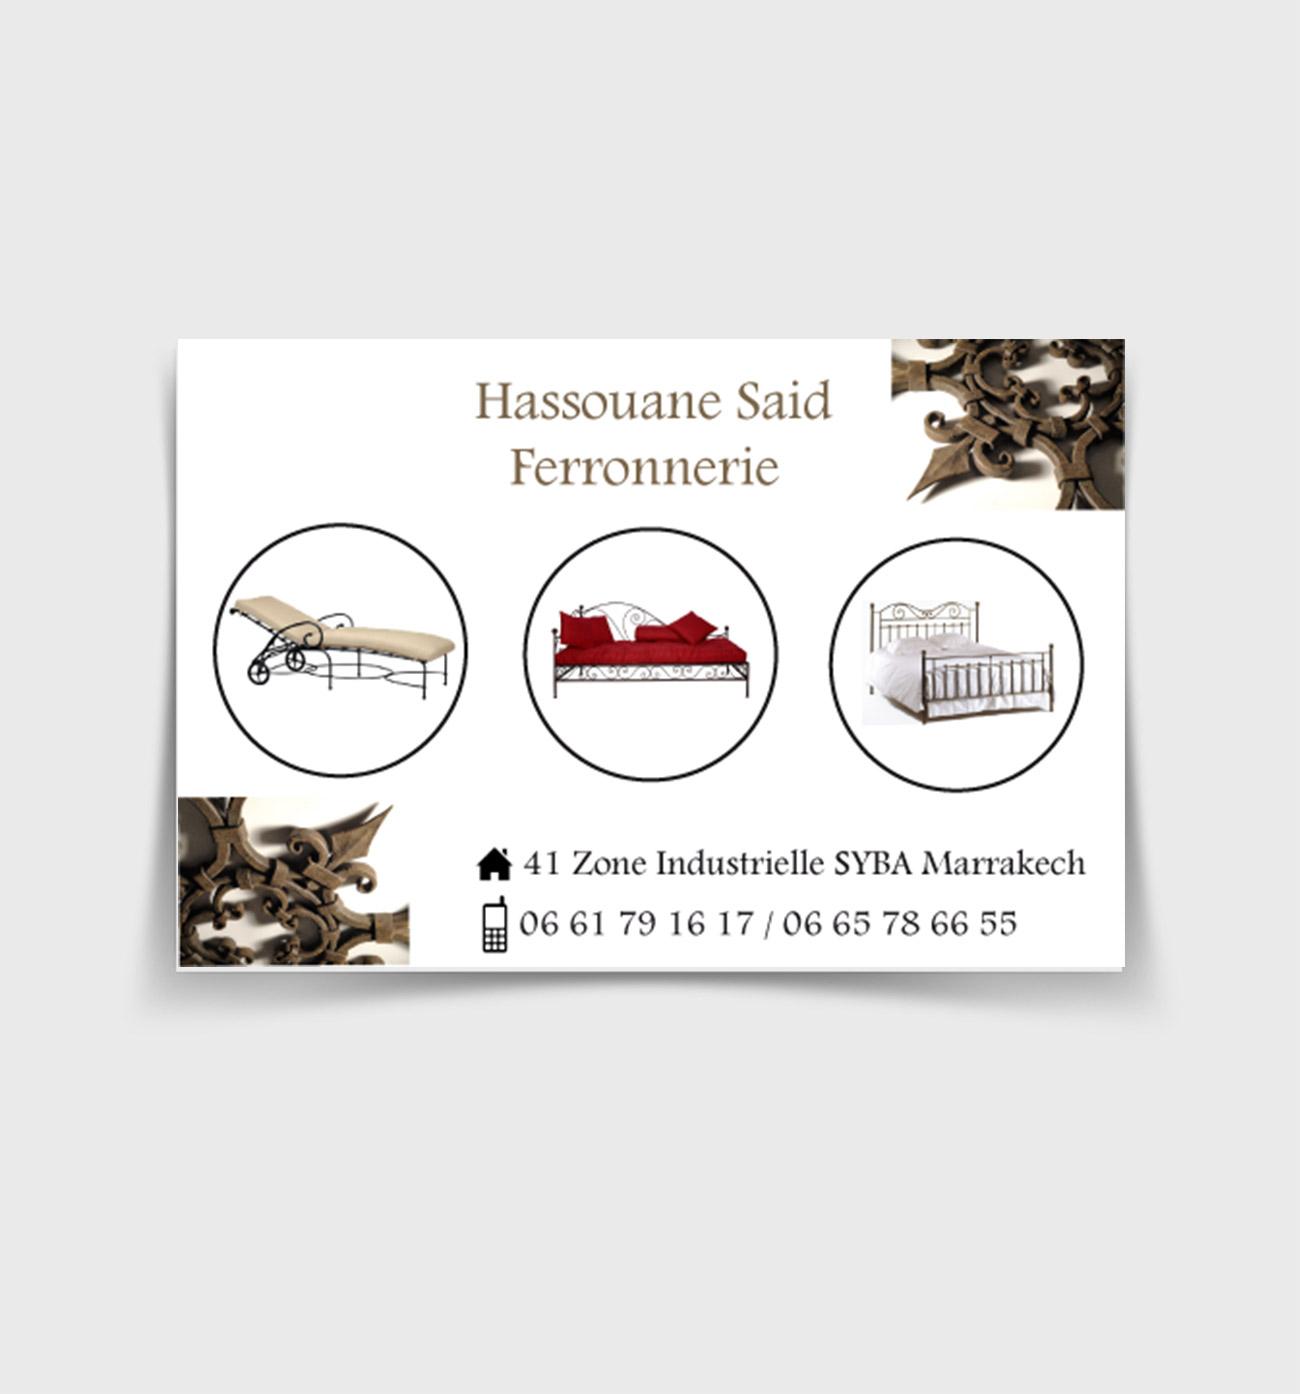 Hassouane said Ferronnerie